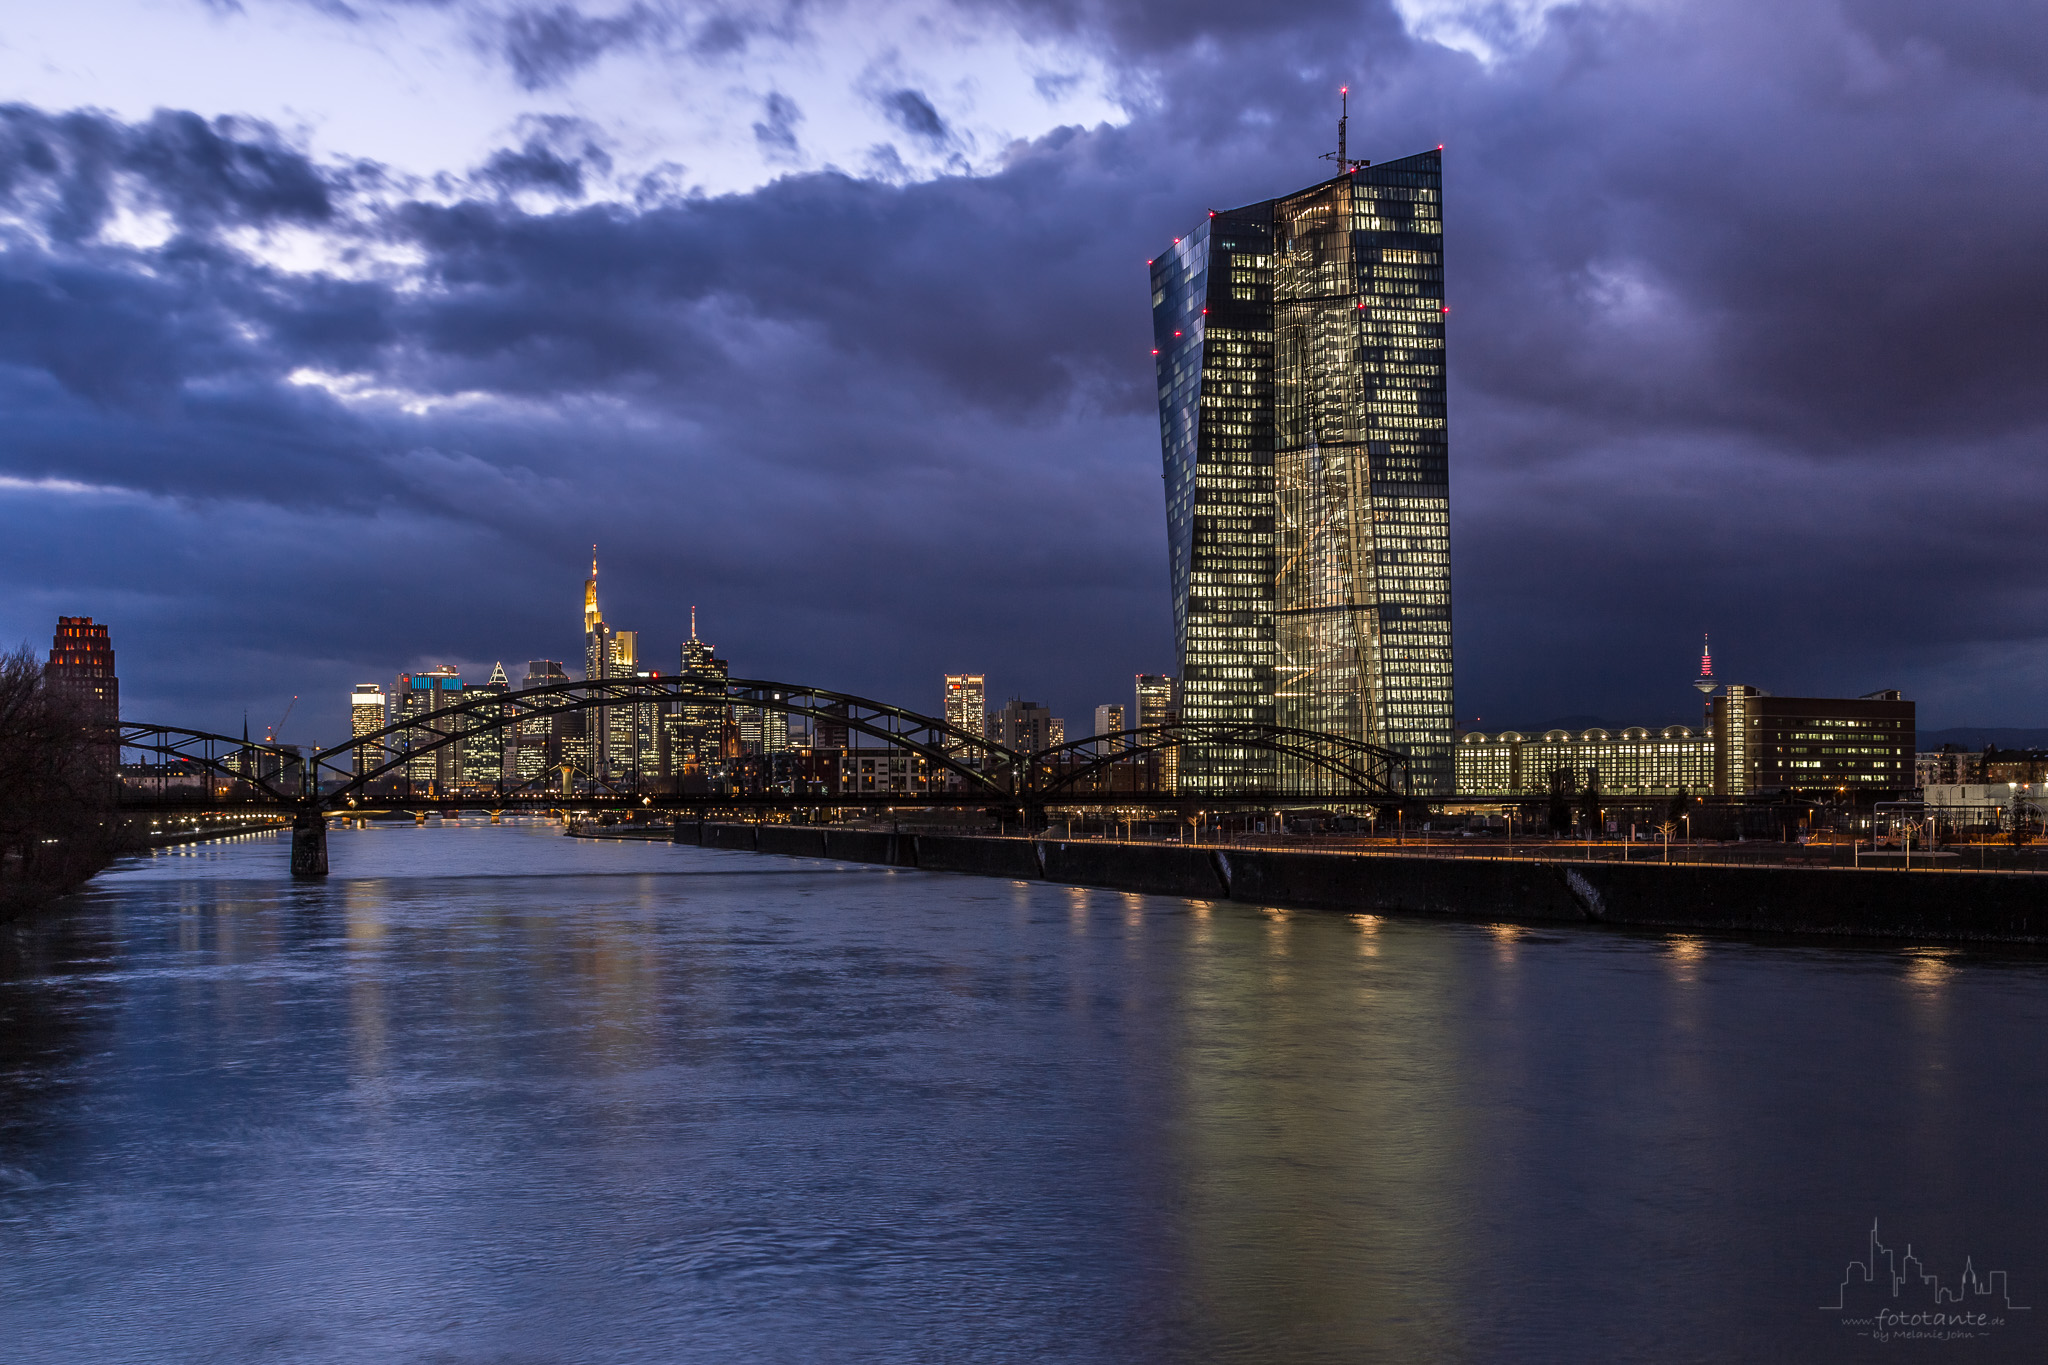 EZB-Frankfurt-Main-Skyline.jpg#asset:1488